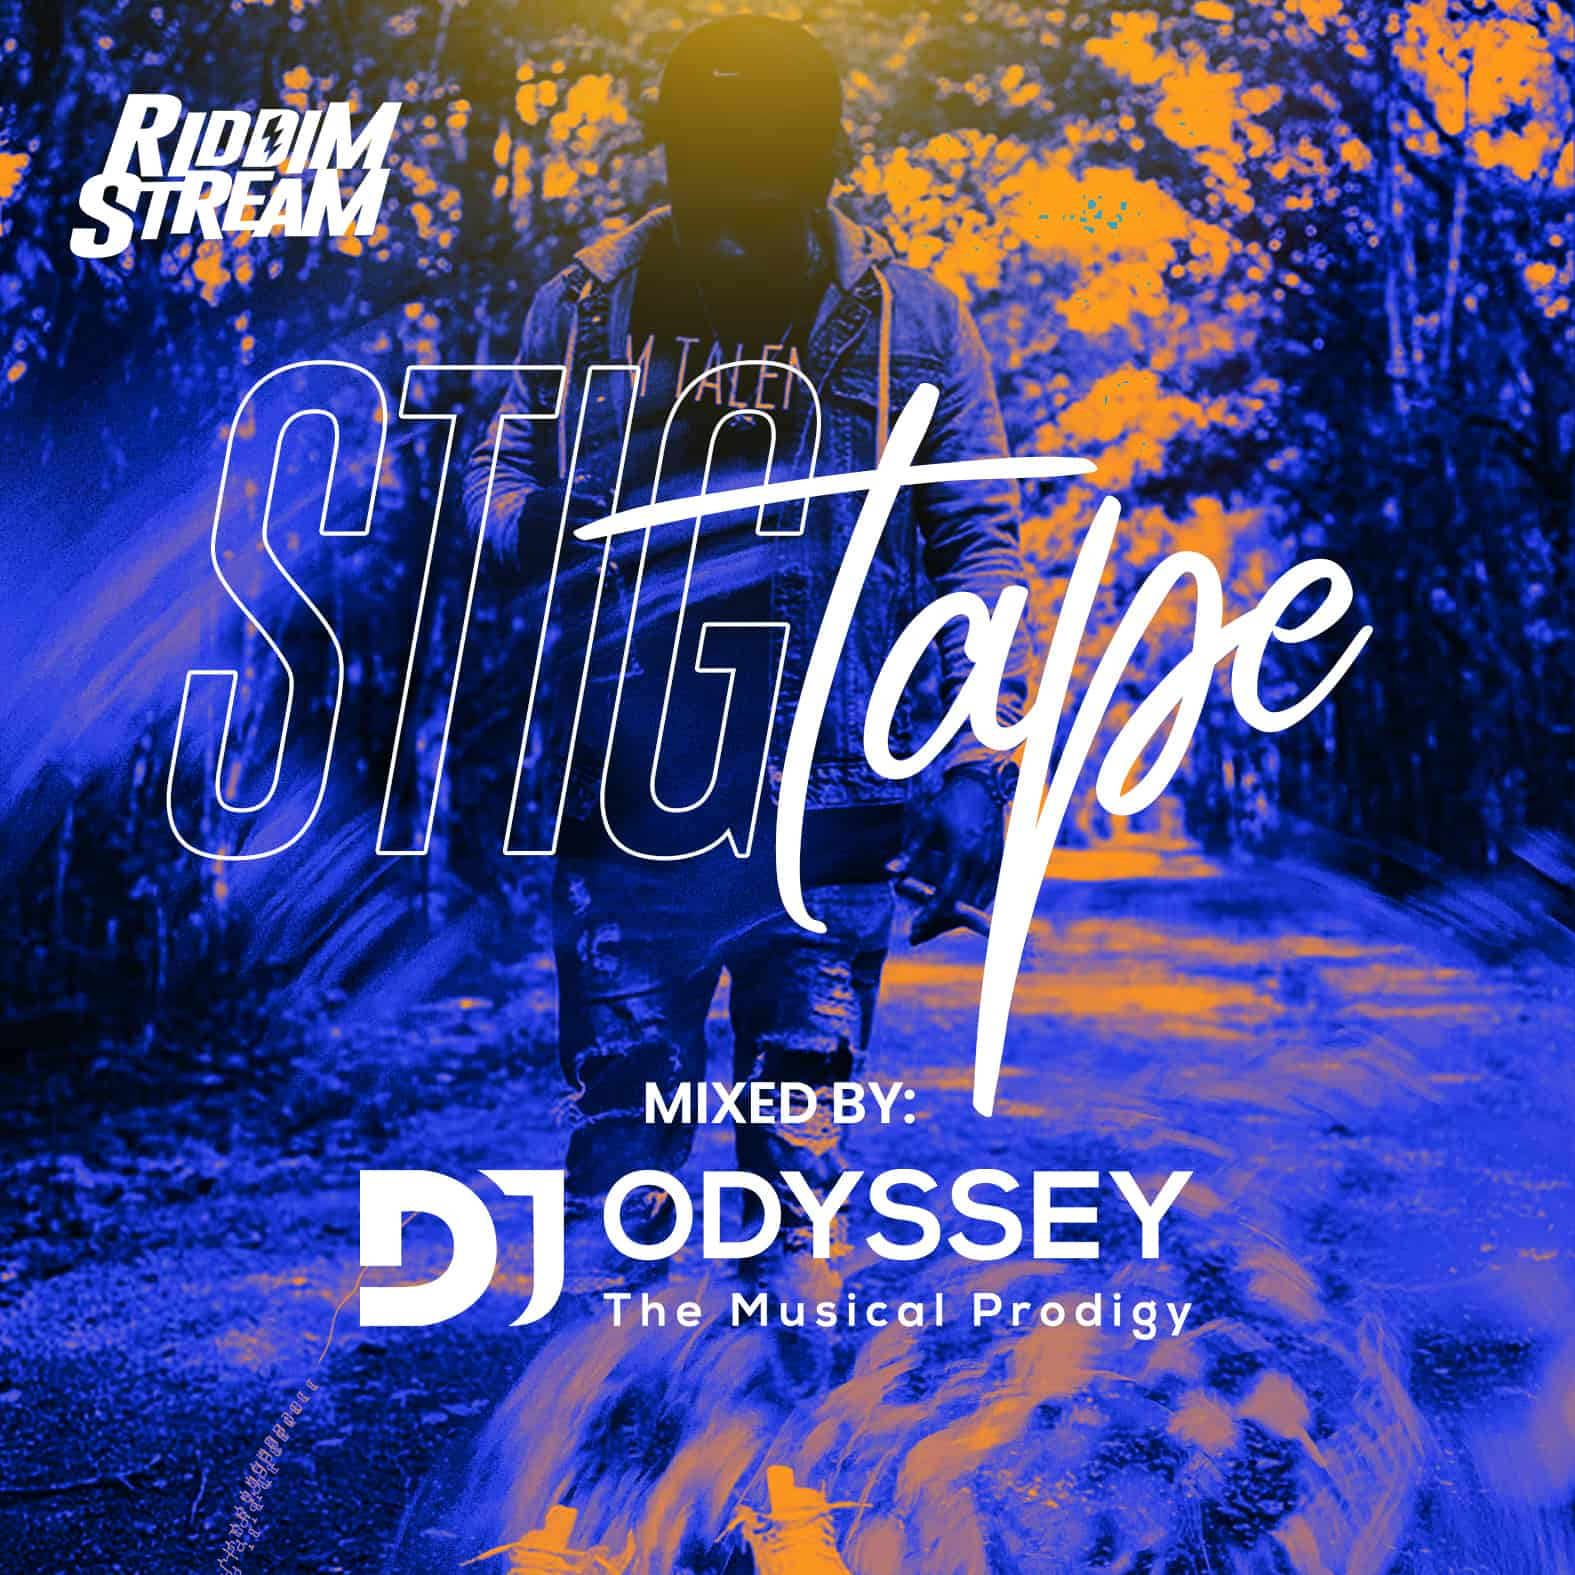 DJ Odyssey - STIGtape